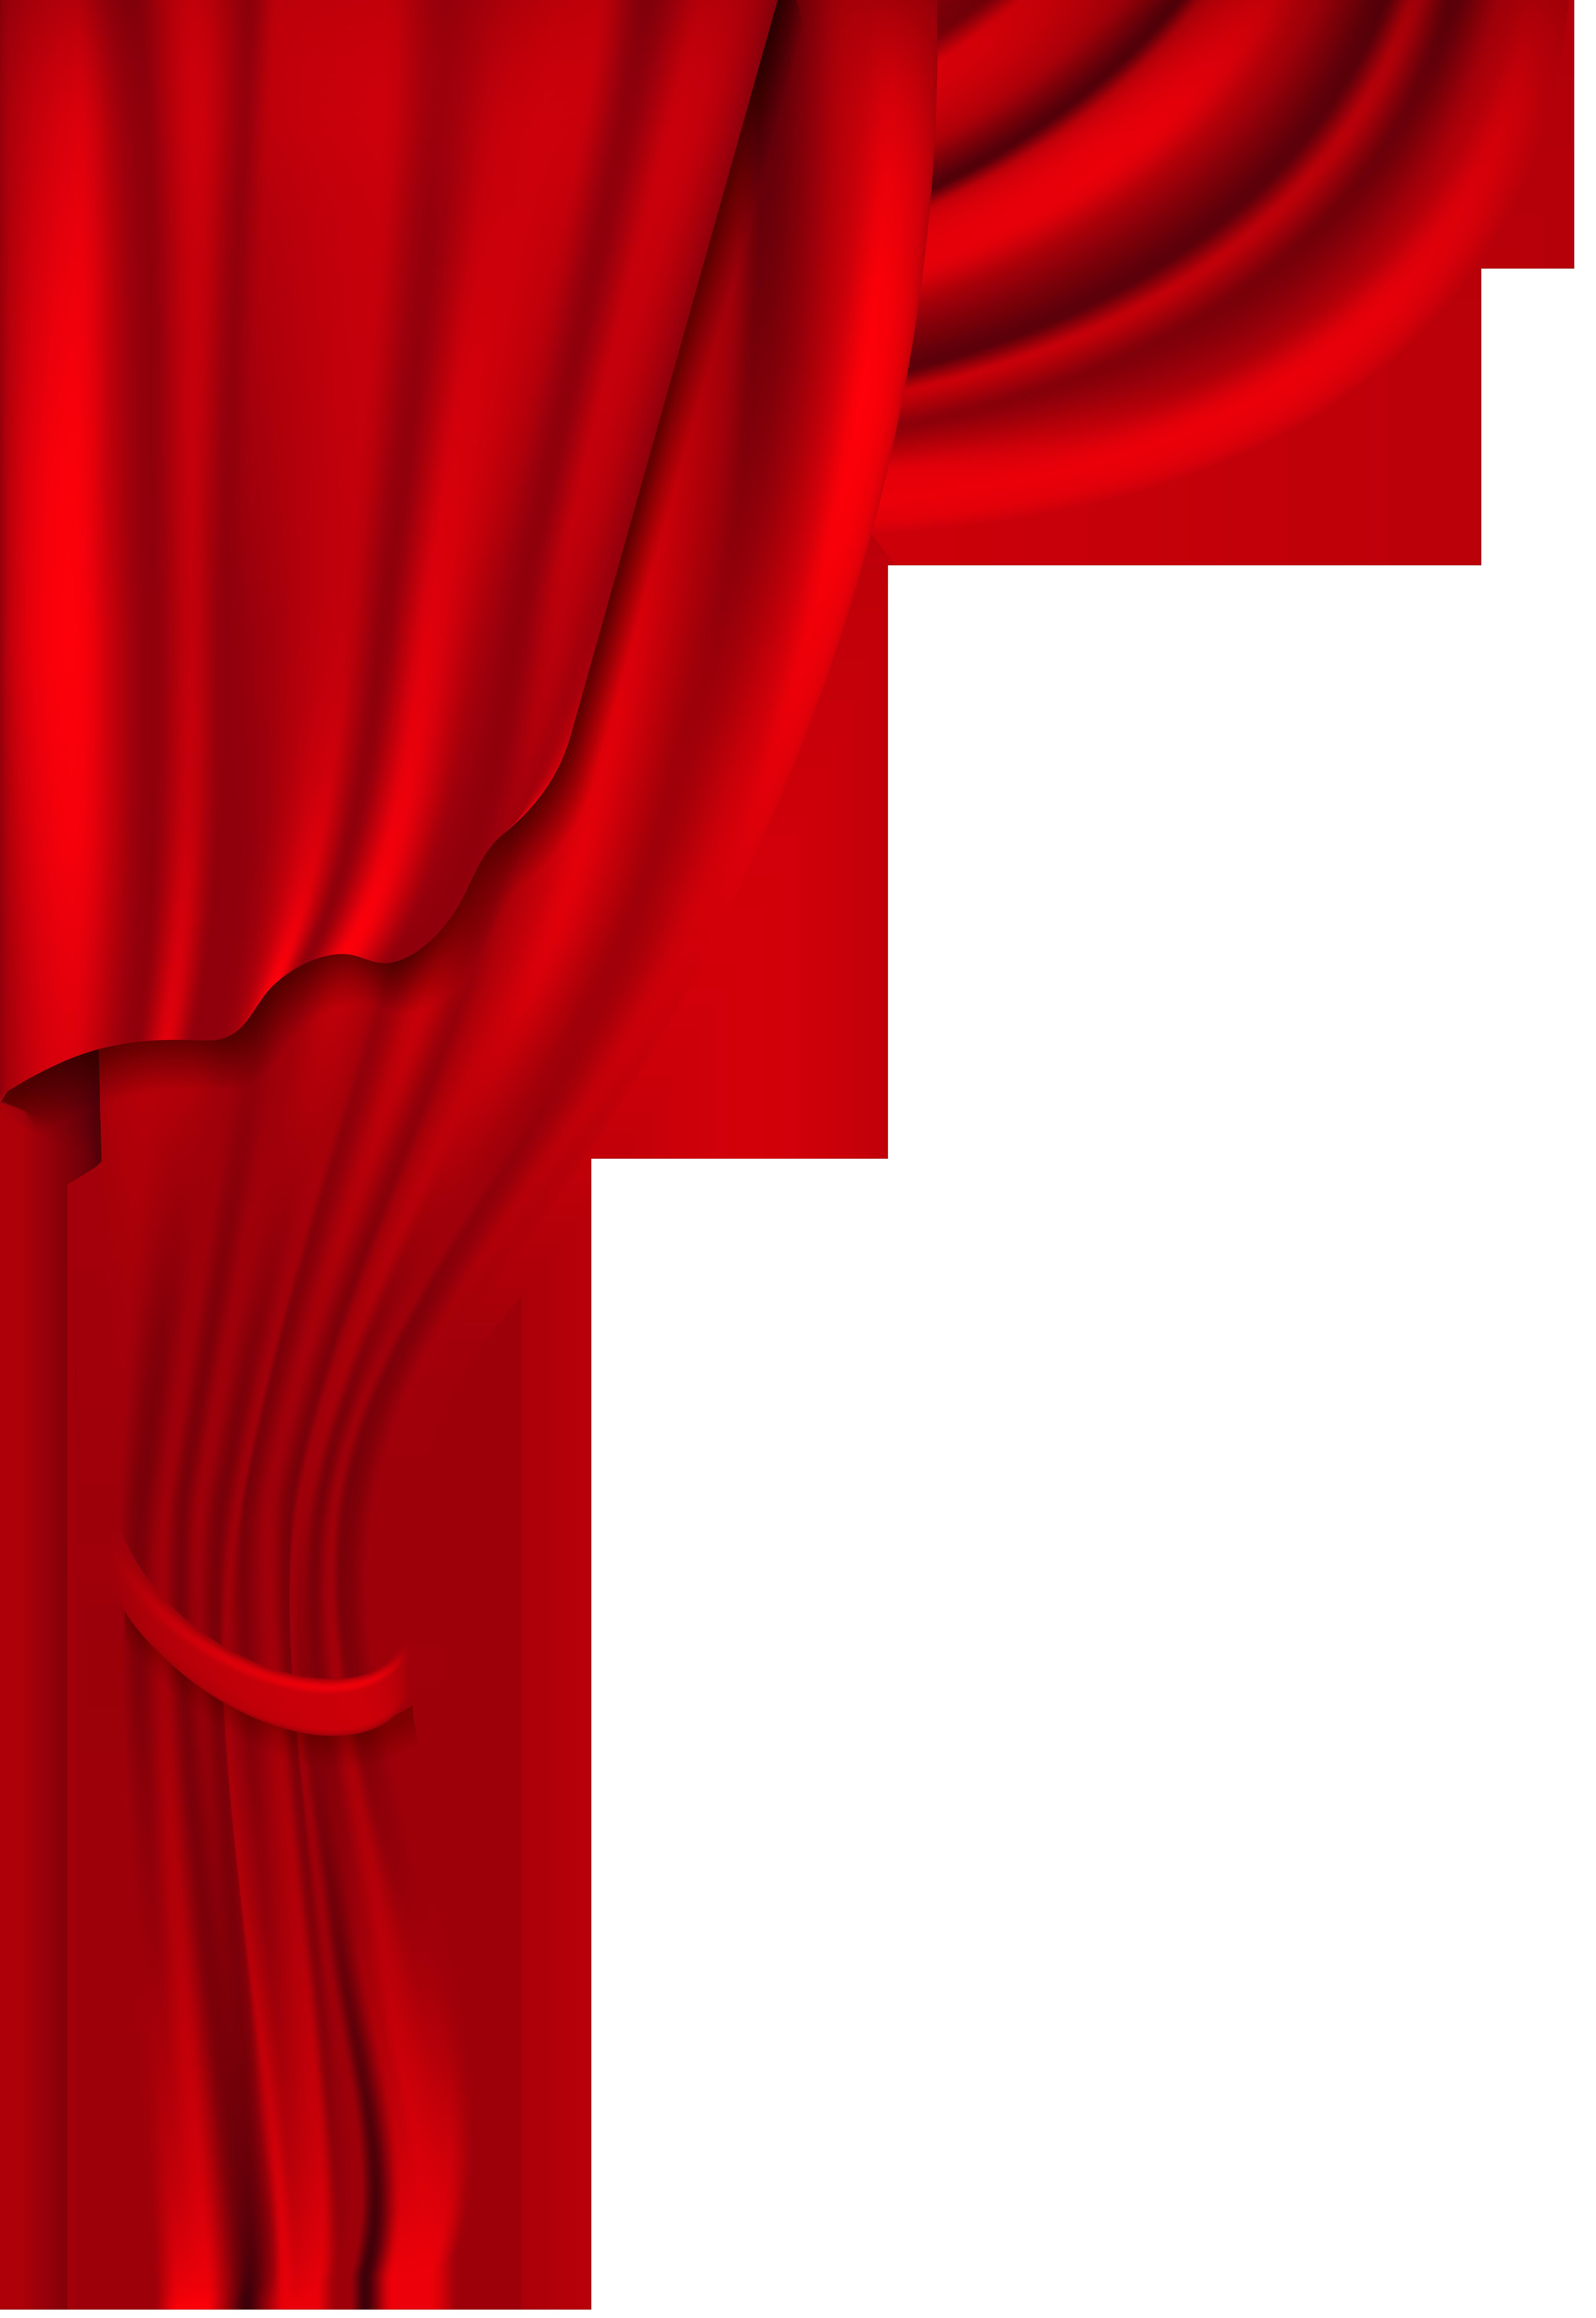 Red curtain transparent clip. Curtains clipart pixel art